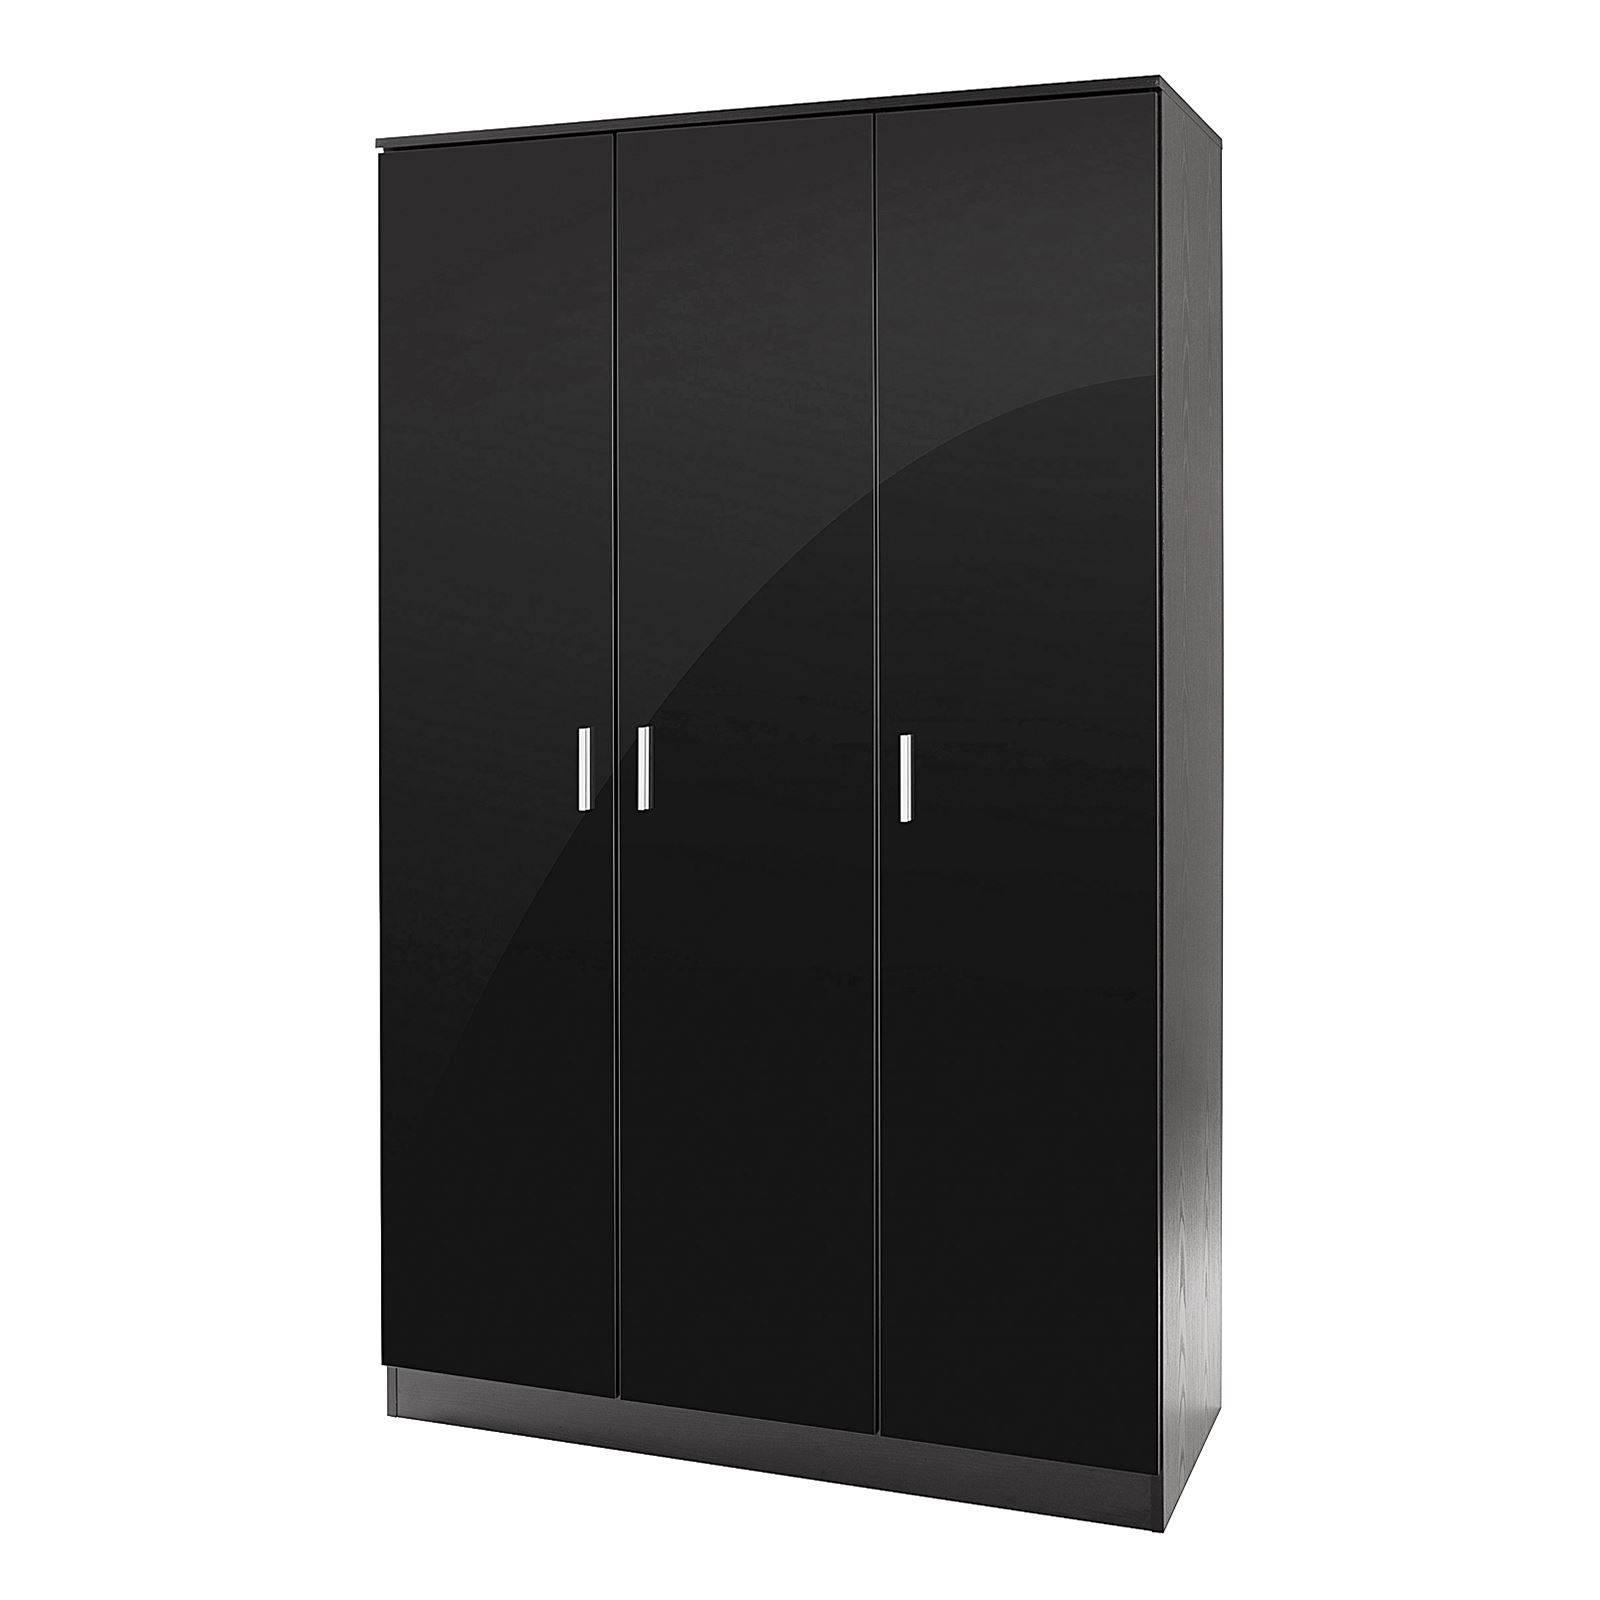 Bedroom Furniture 3 Piece Set Black Gloss Wardrobe Drawer Bedside Pertaining To 3 Door Black Gloss Wardrobes (View 2 of 15)